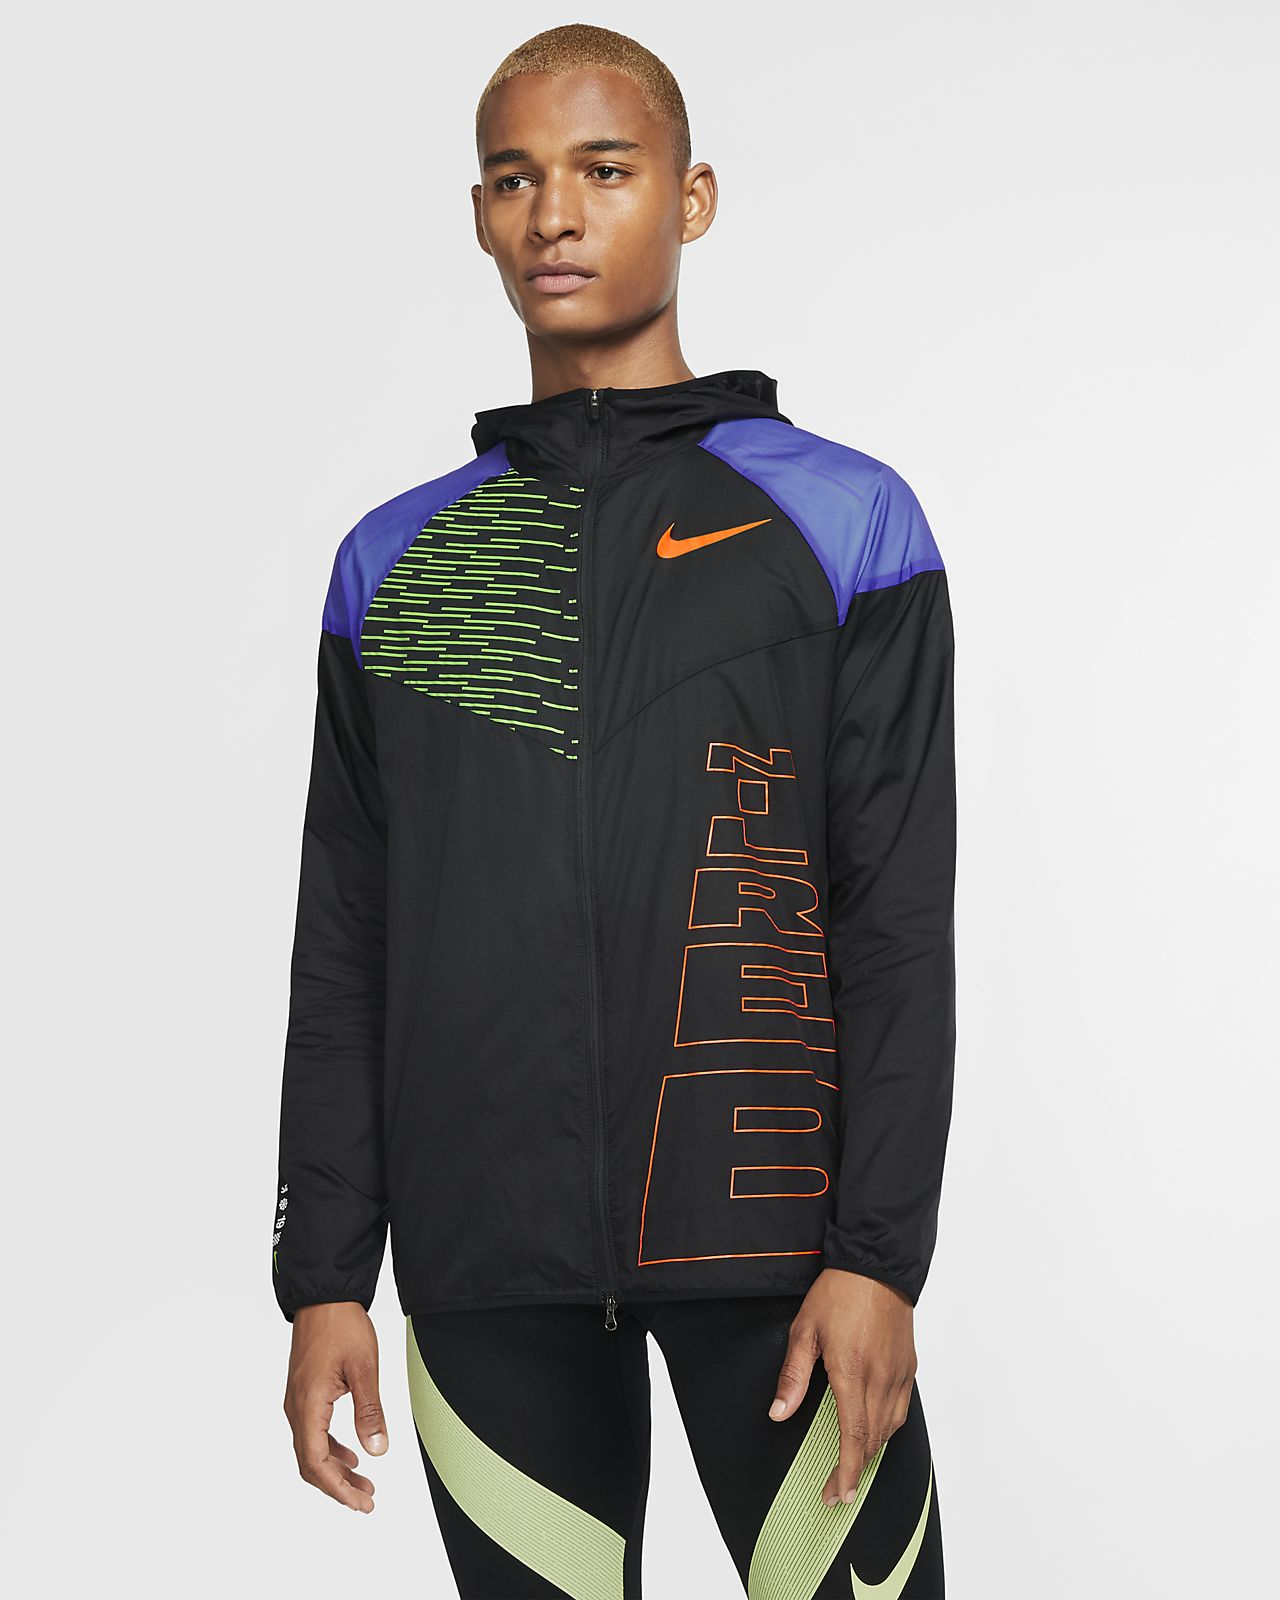 Nike Running Berlin férfi Windrunner kabát